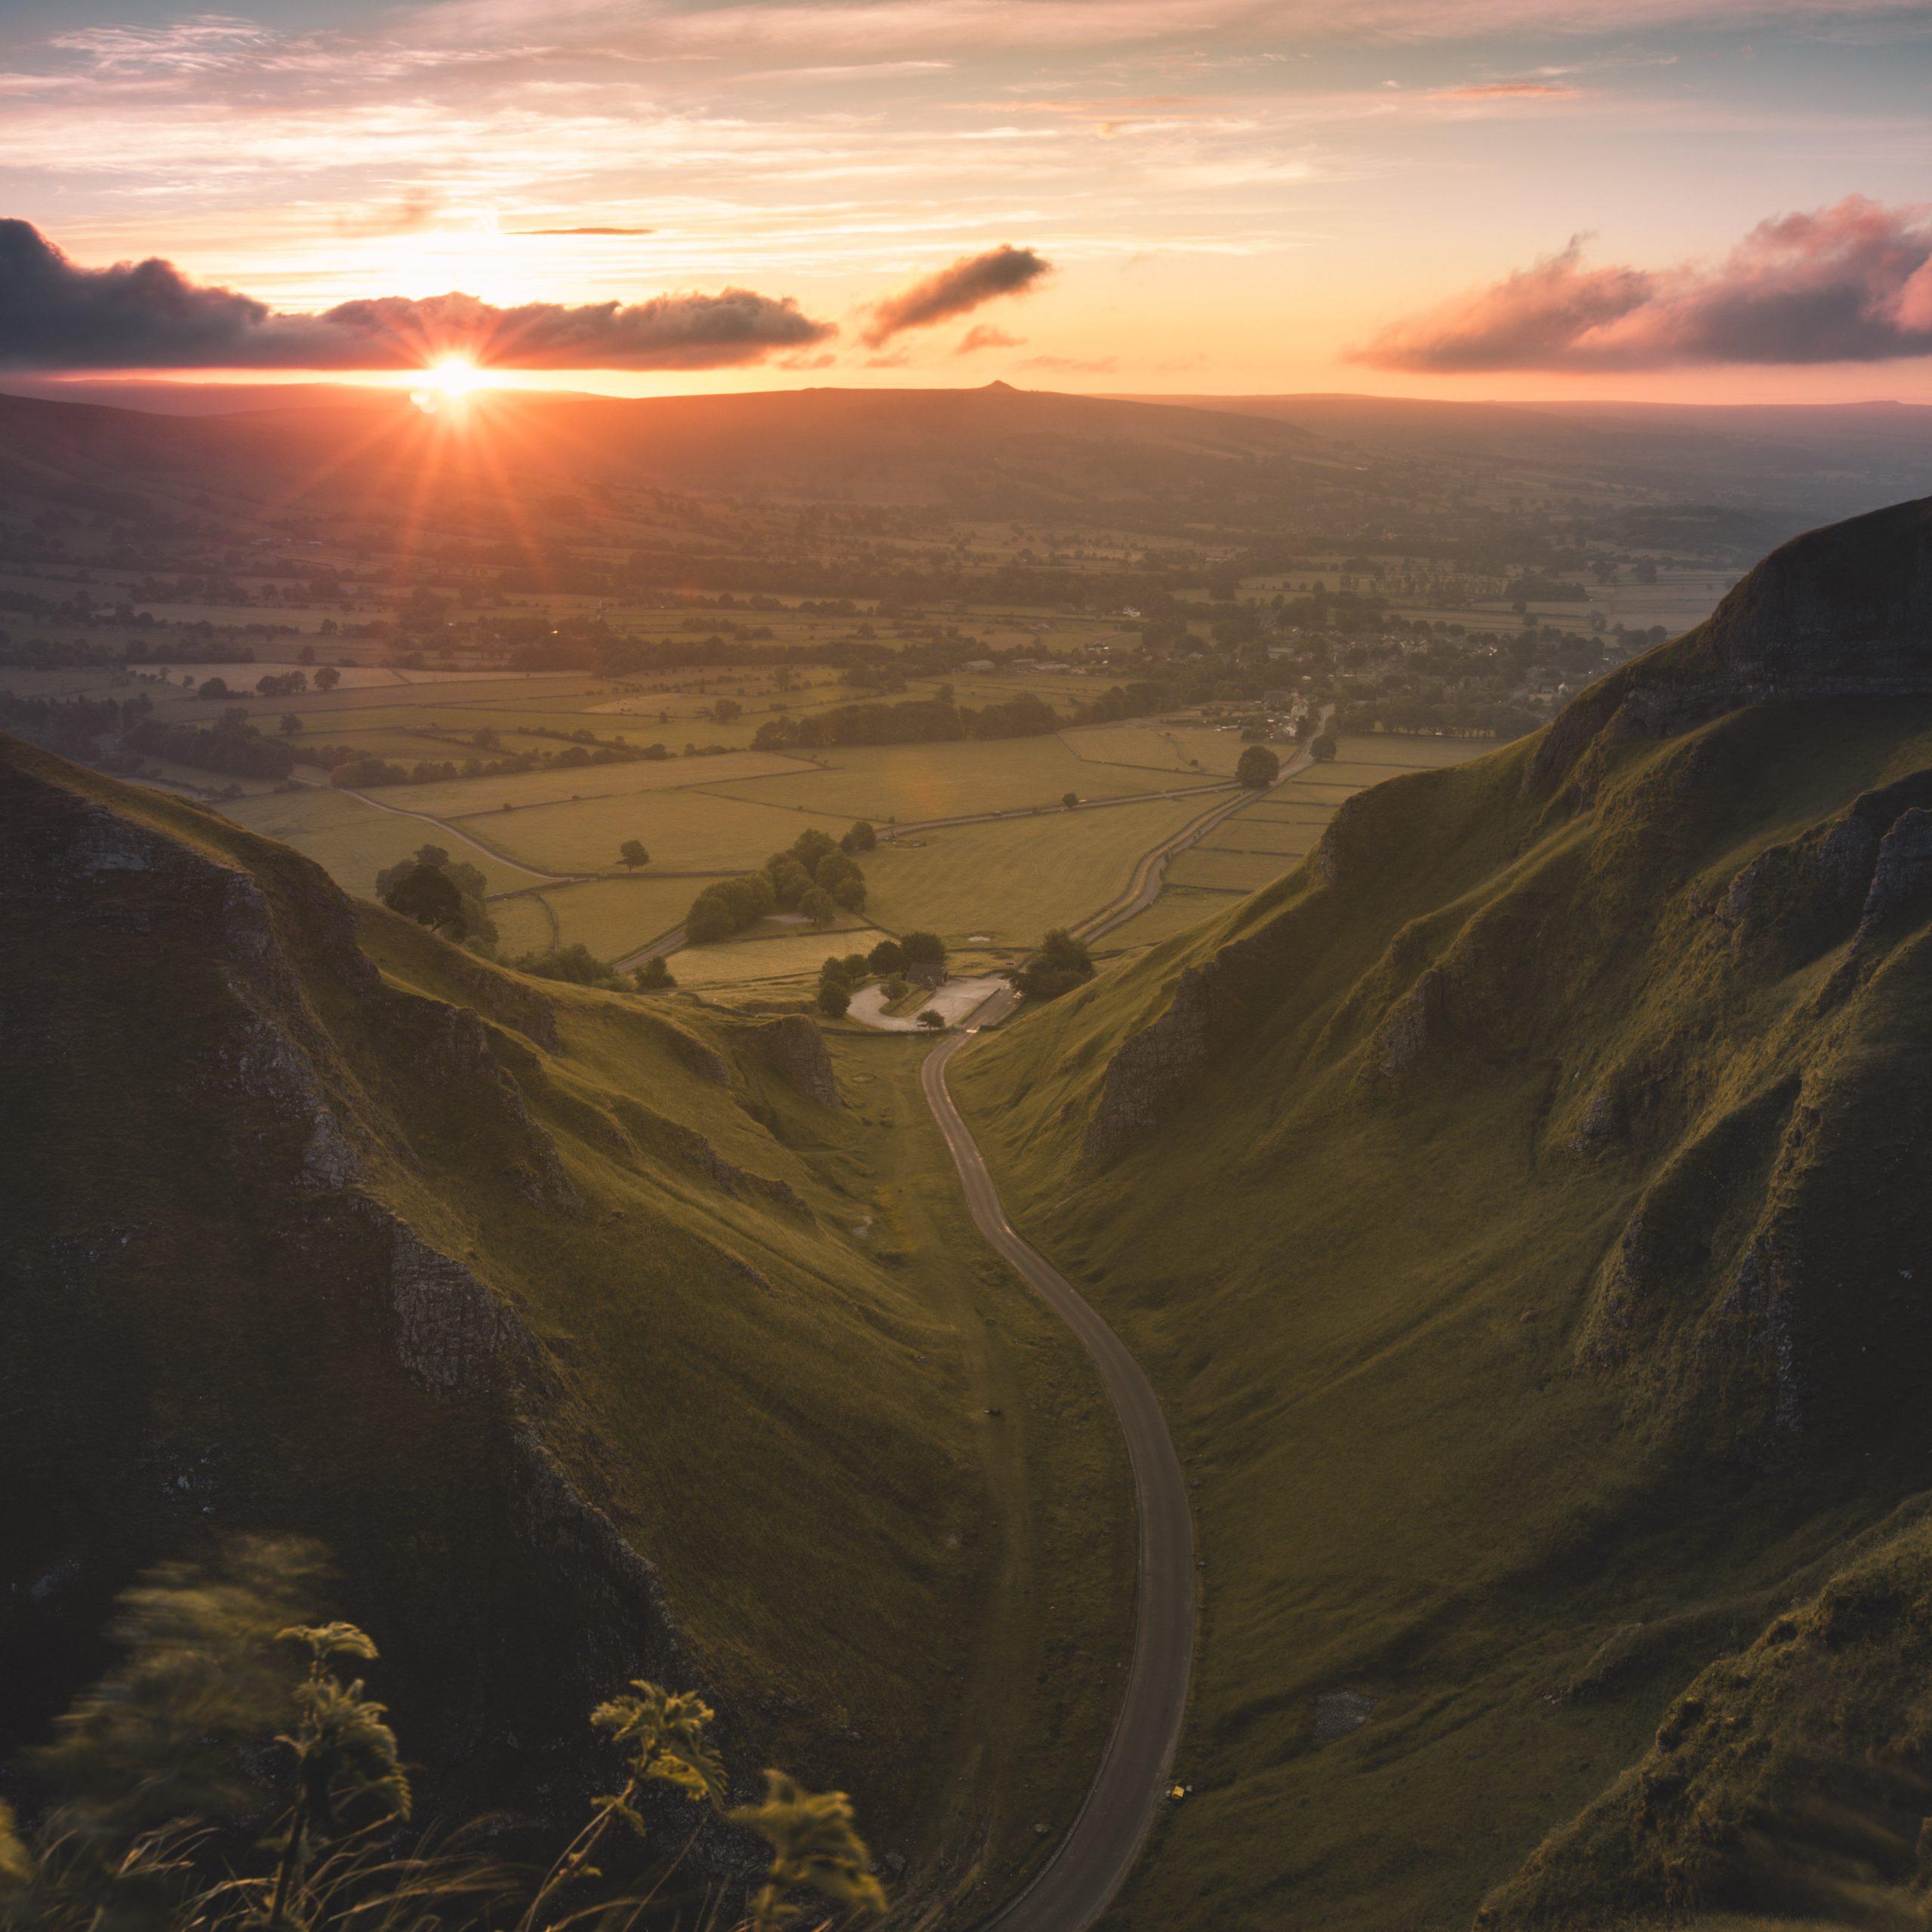 Winnats Pass at sunrise, Derbyshire